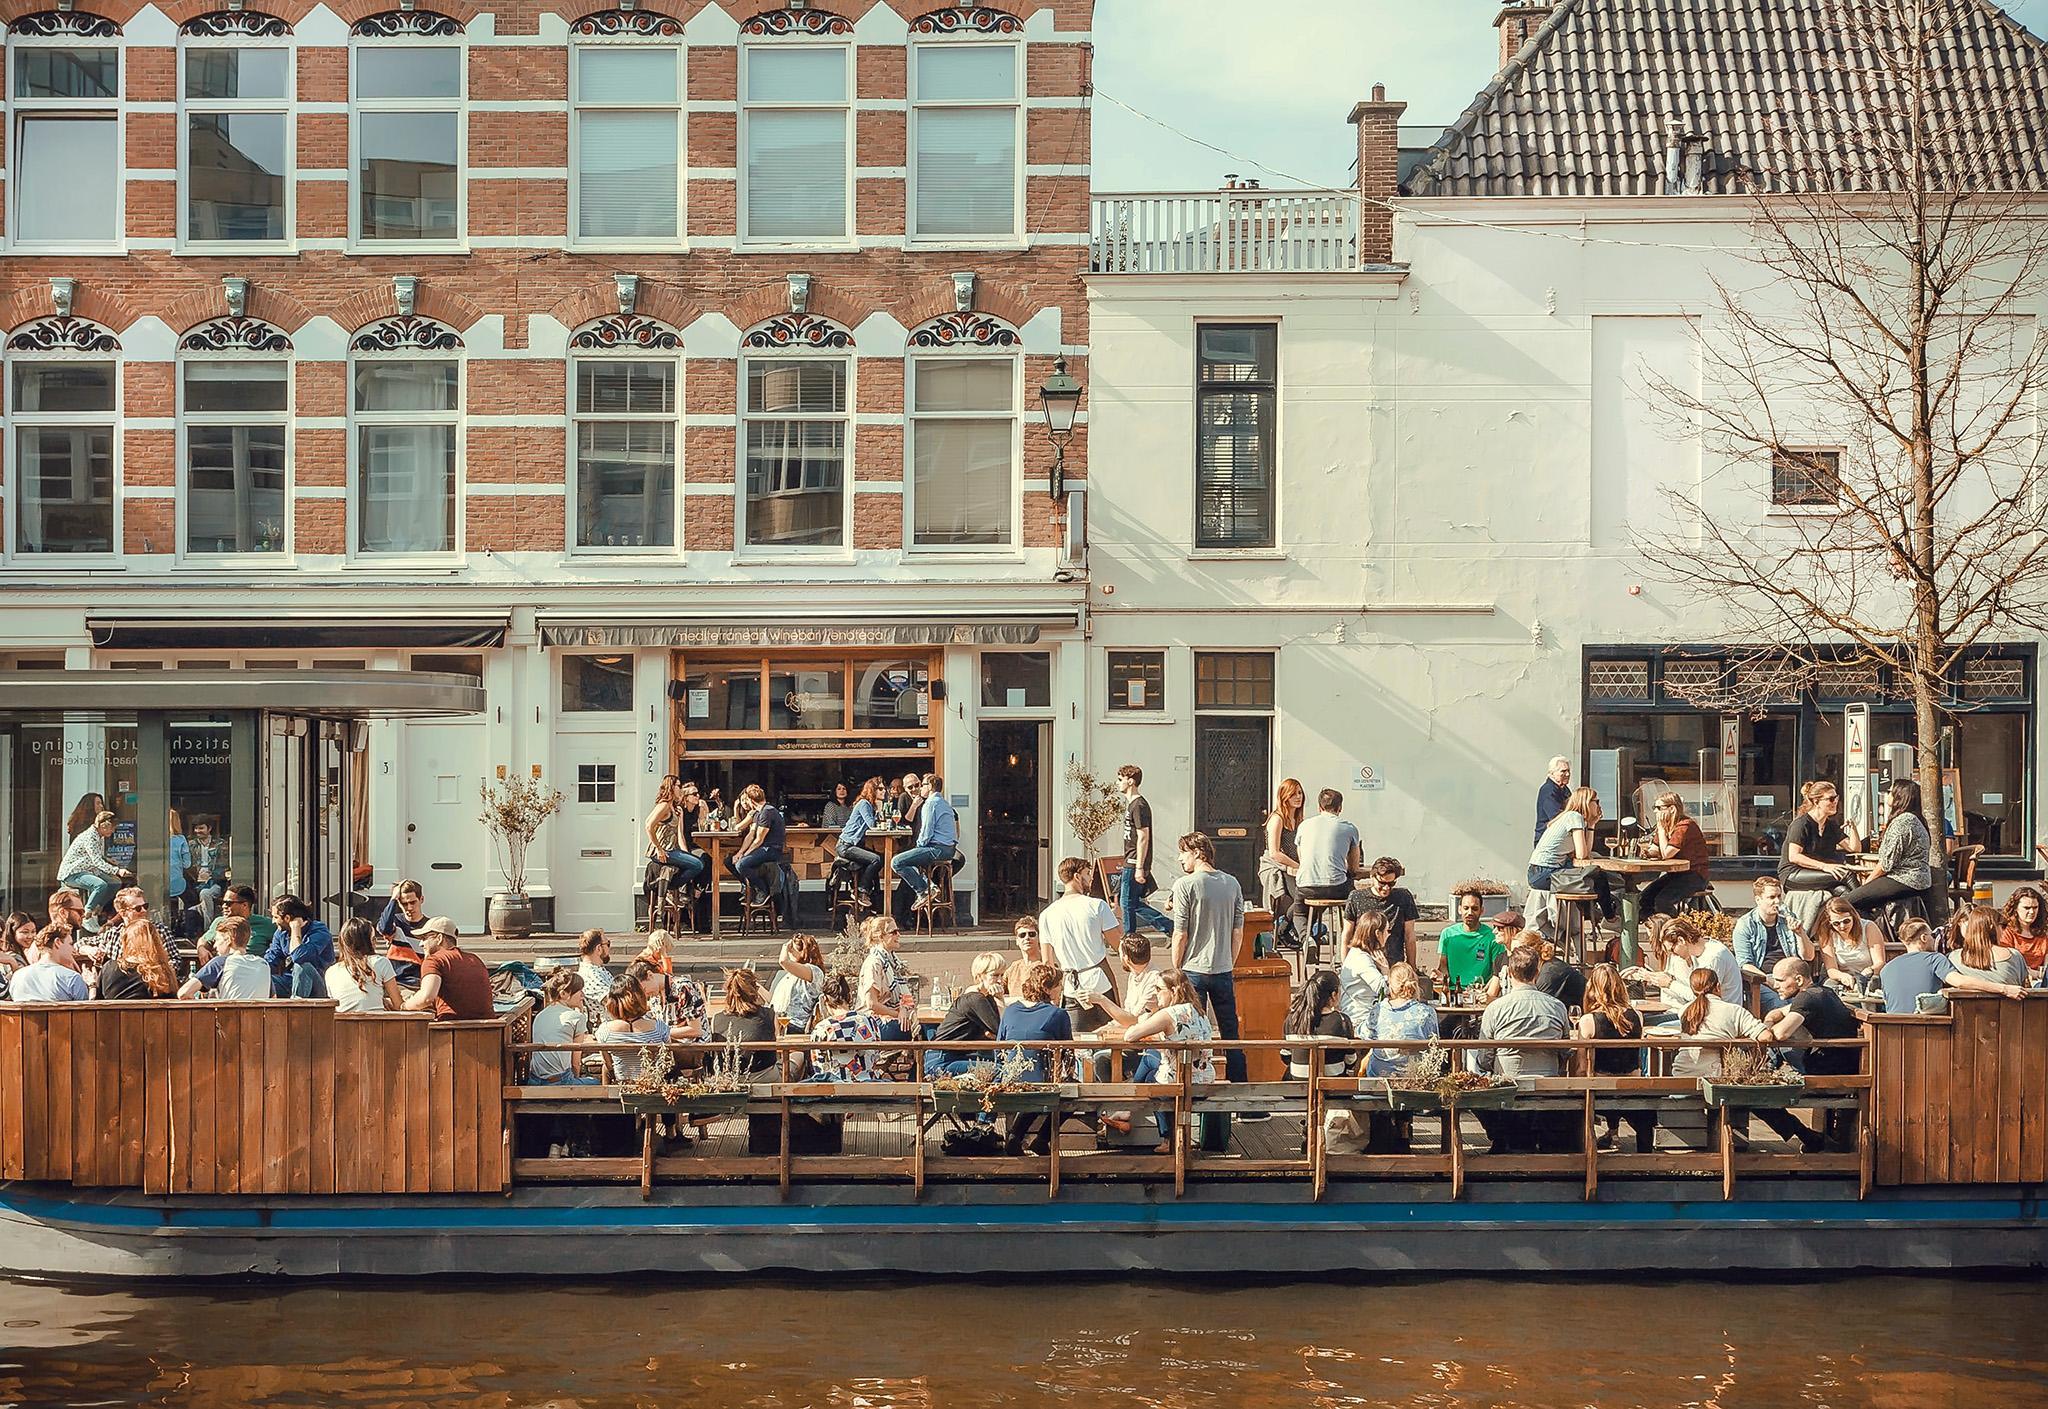 12. Amsterdam, Netherlands